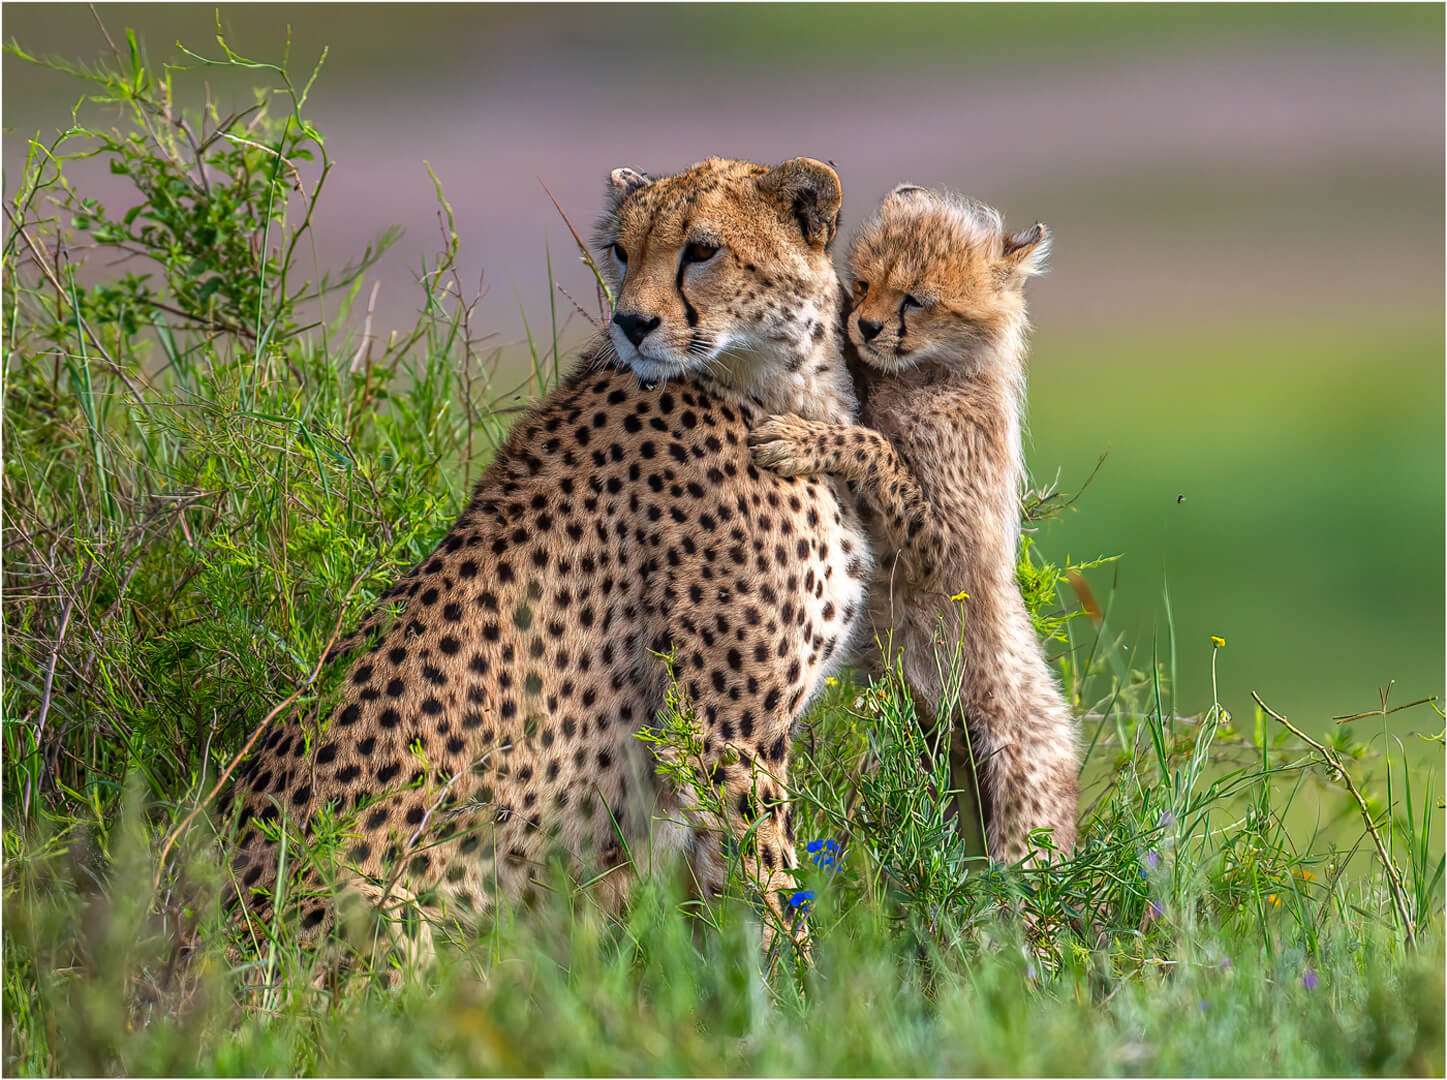 Marcy Starnes Cheetah Kitten 01